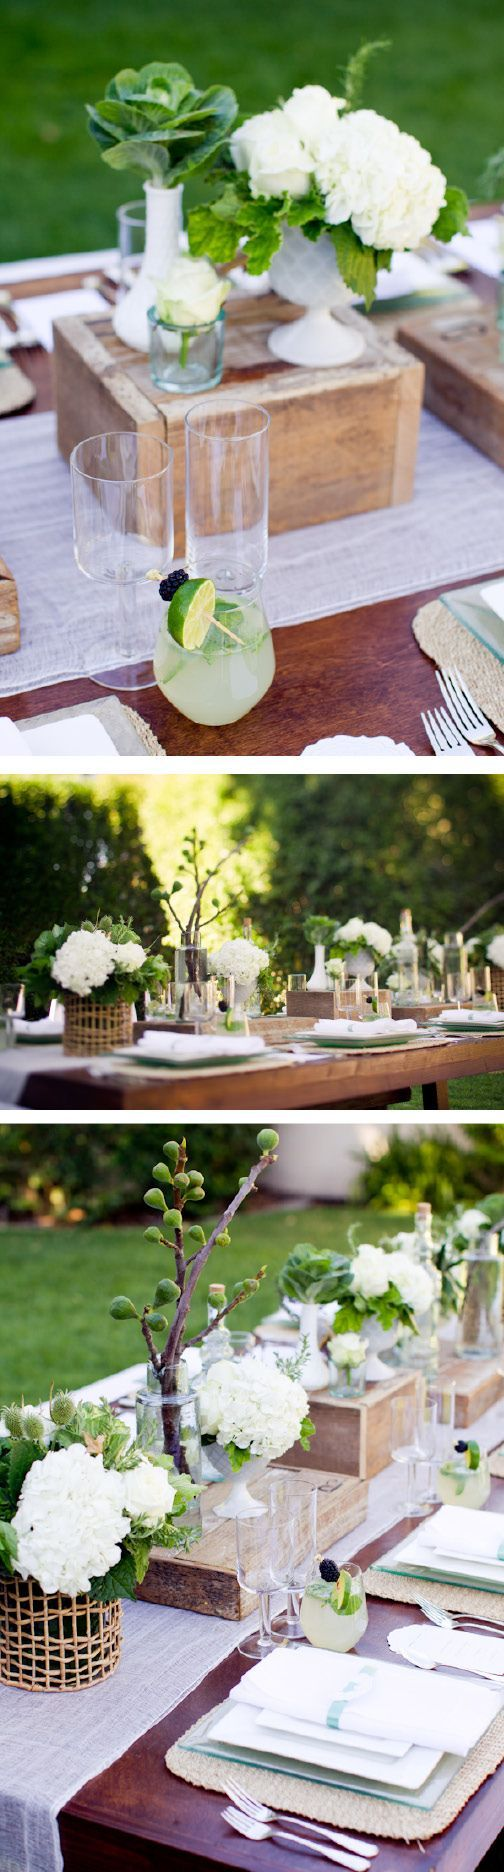 White and green setting table  Green grape and white flowers    Uva verde e fiori bianchi   http://theproposalwedding.blogspot.it/ #autumn #fall #wedding #grape #wine #september #matrimonio #autunno #vino #uva